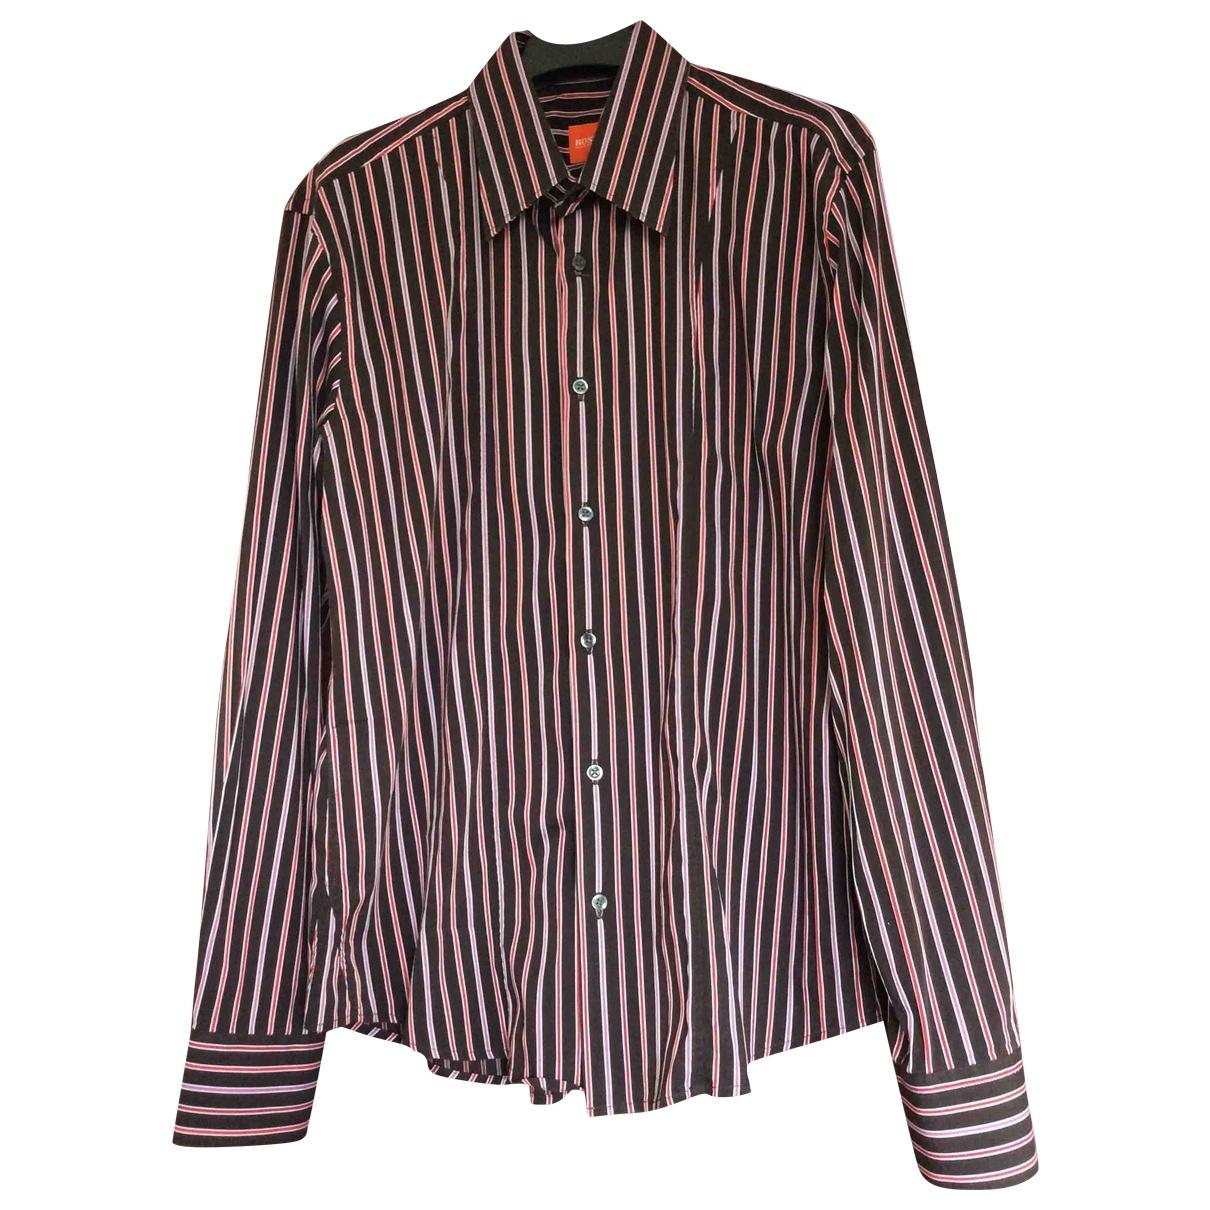 Hugo Boss \N Cotton Shirts for Men XL International